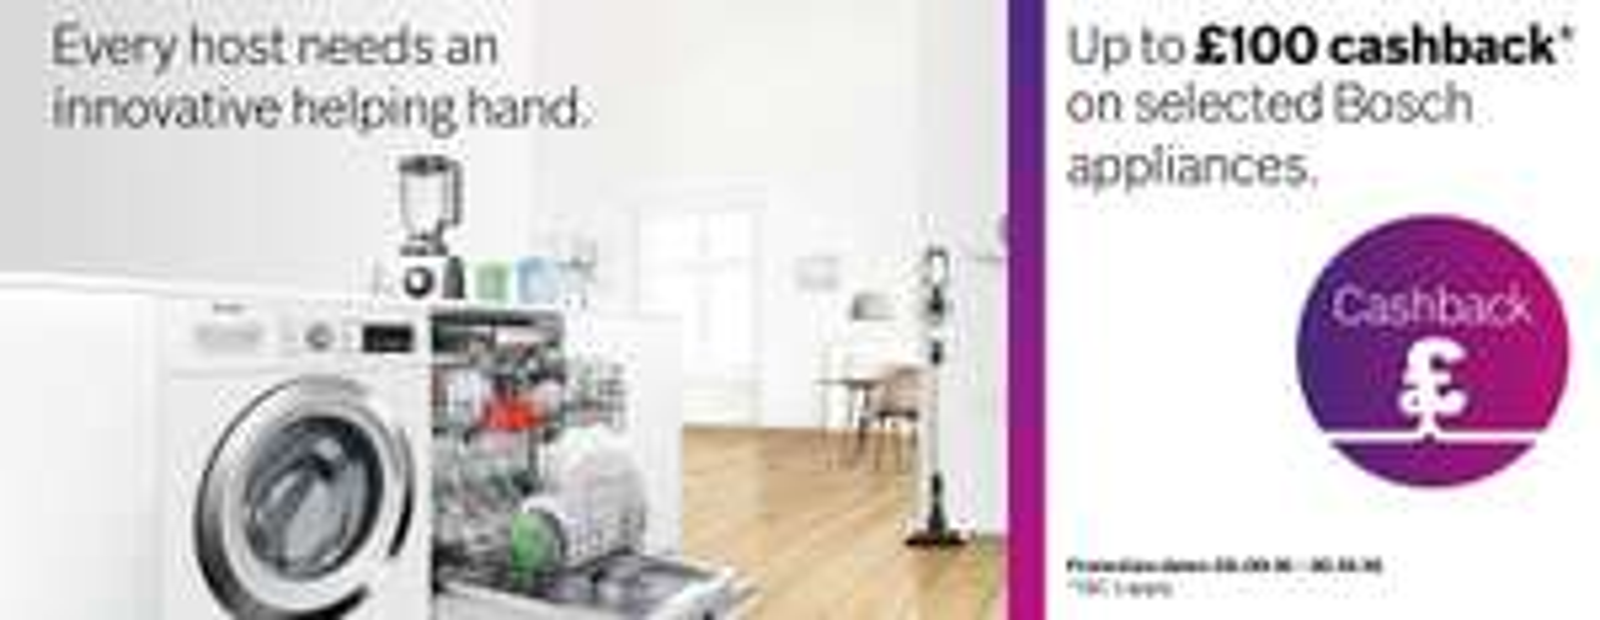 Bosch appliances up to £100 cashback